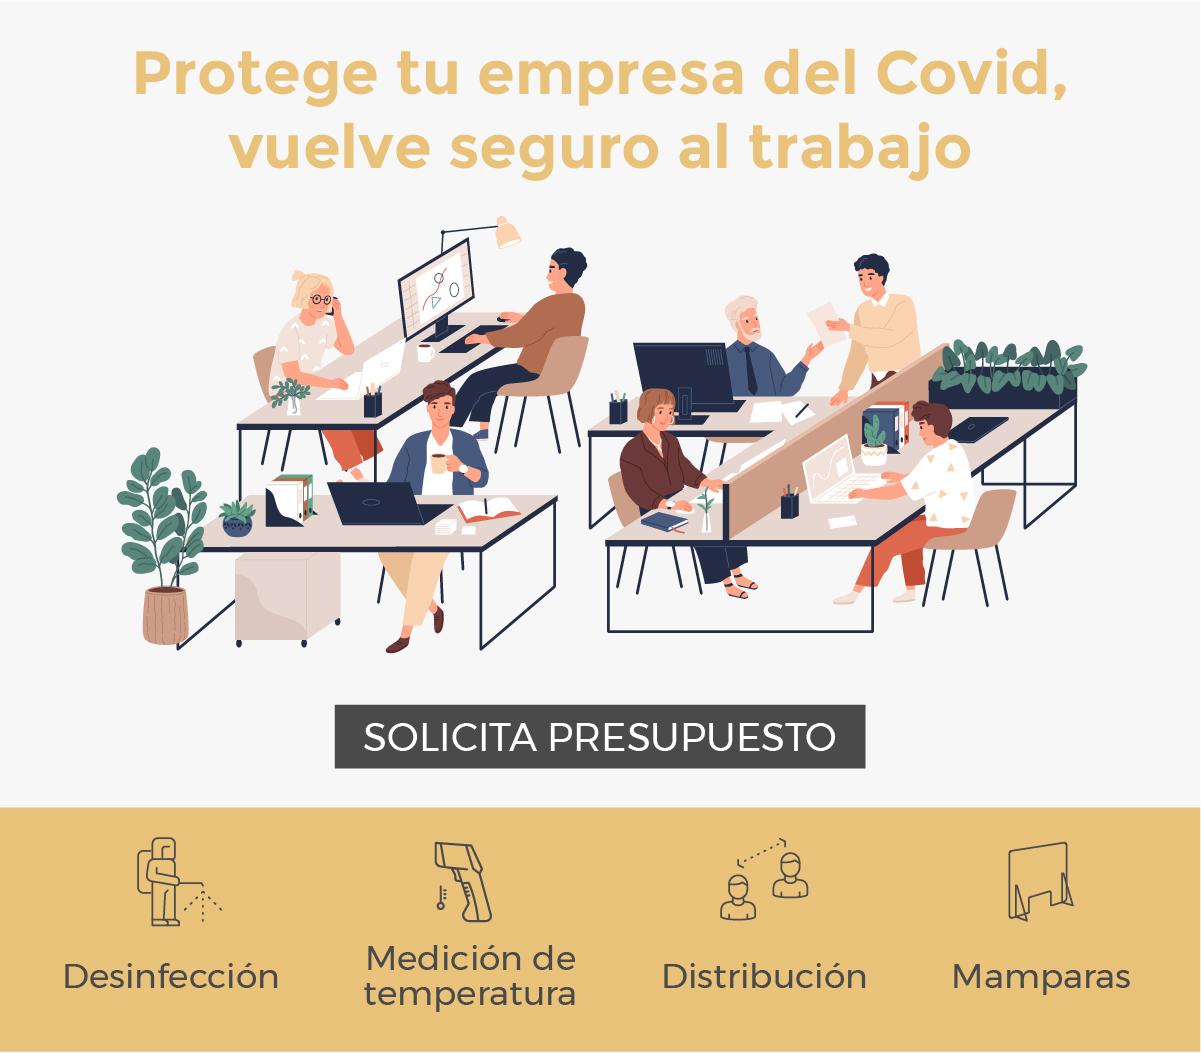 protege tu empresa del Covid - 19